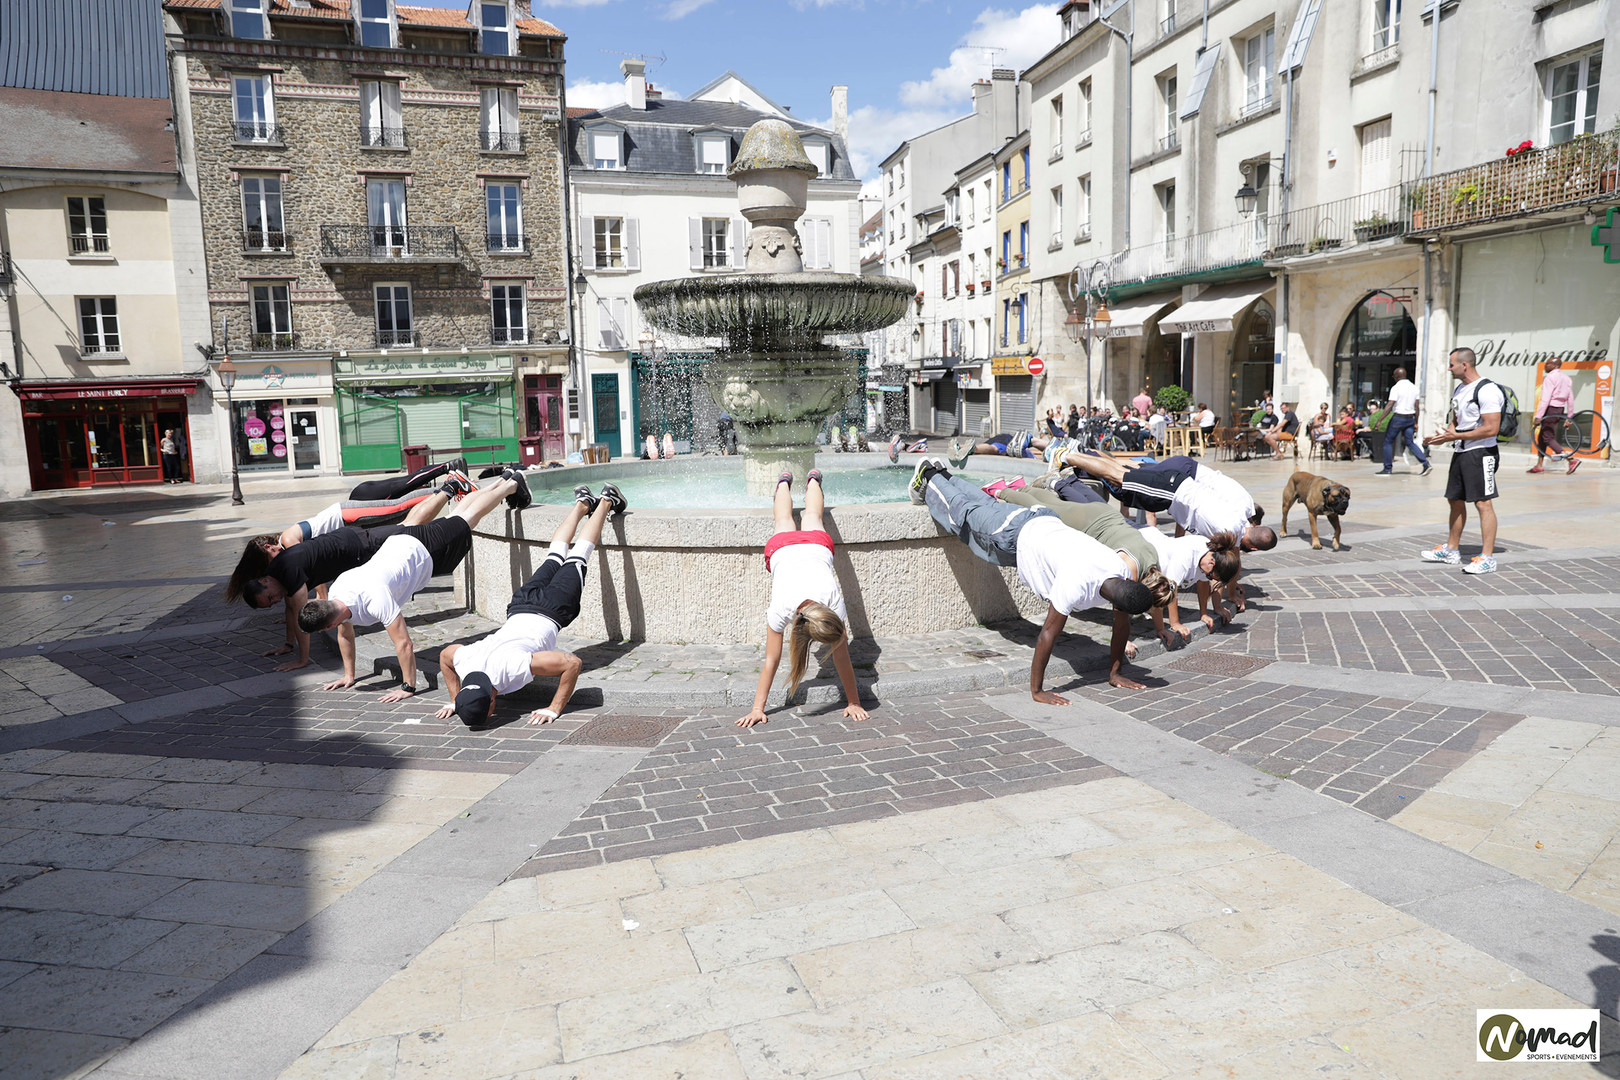 nomad-lagny-street-workout.jpg